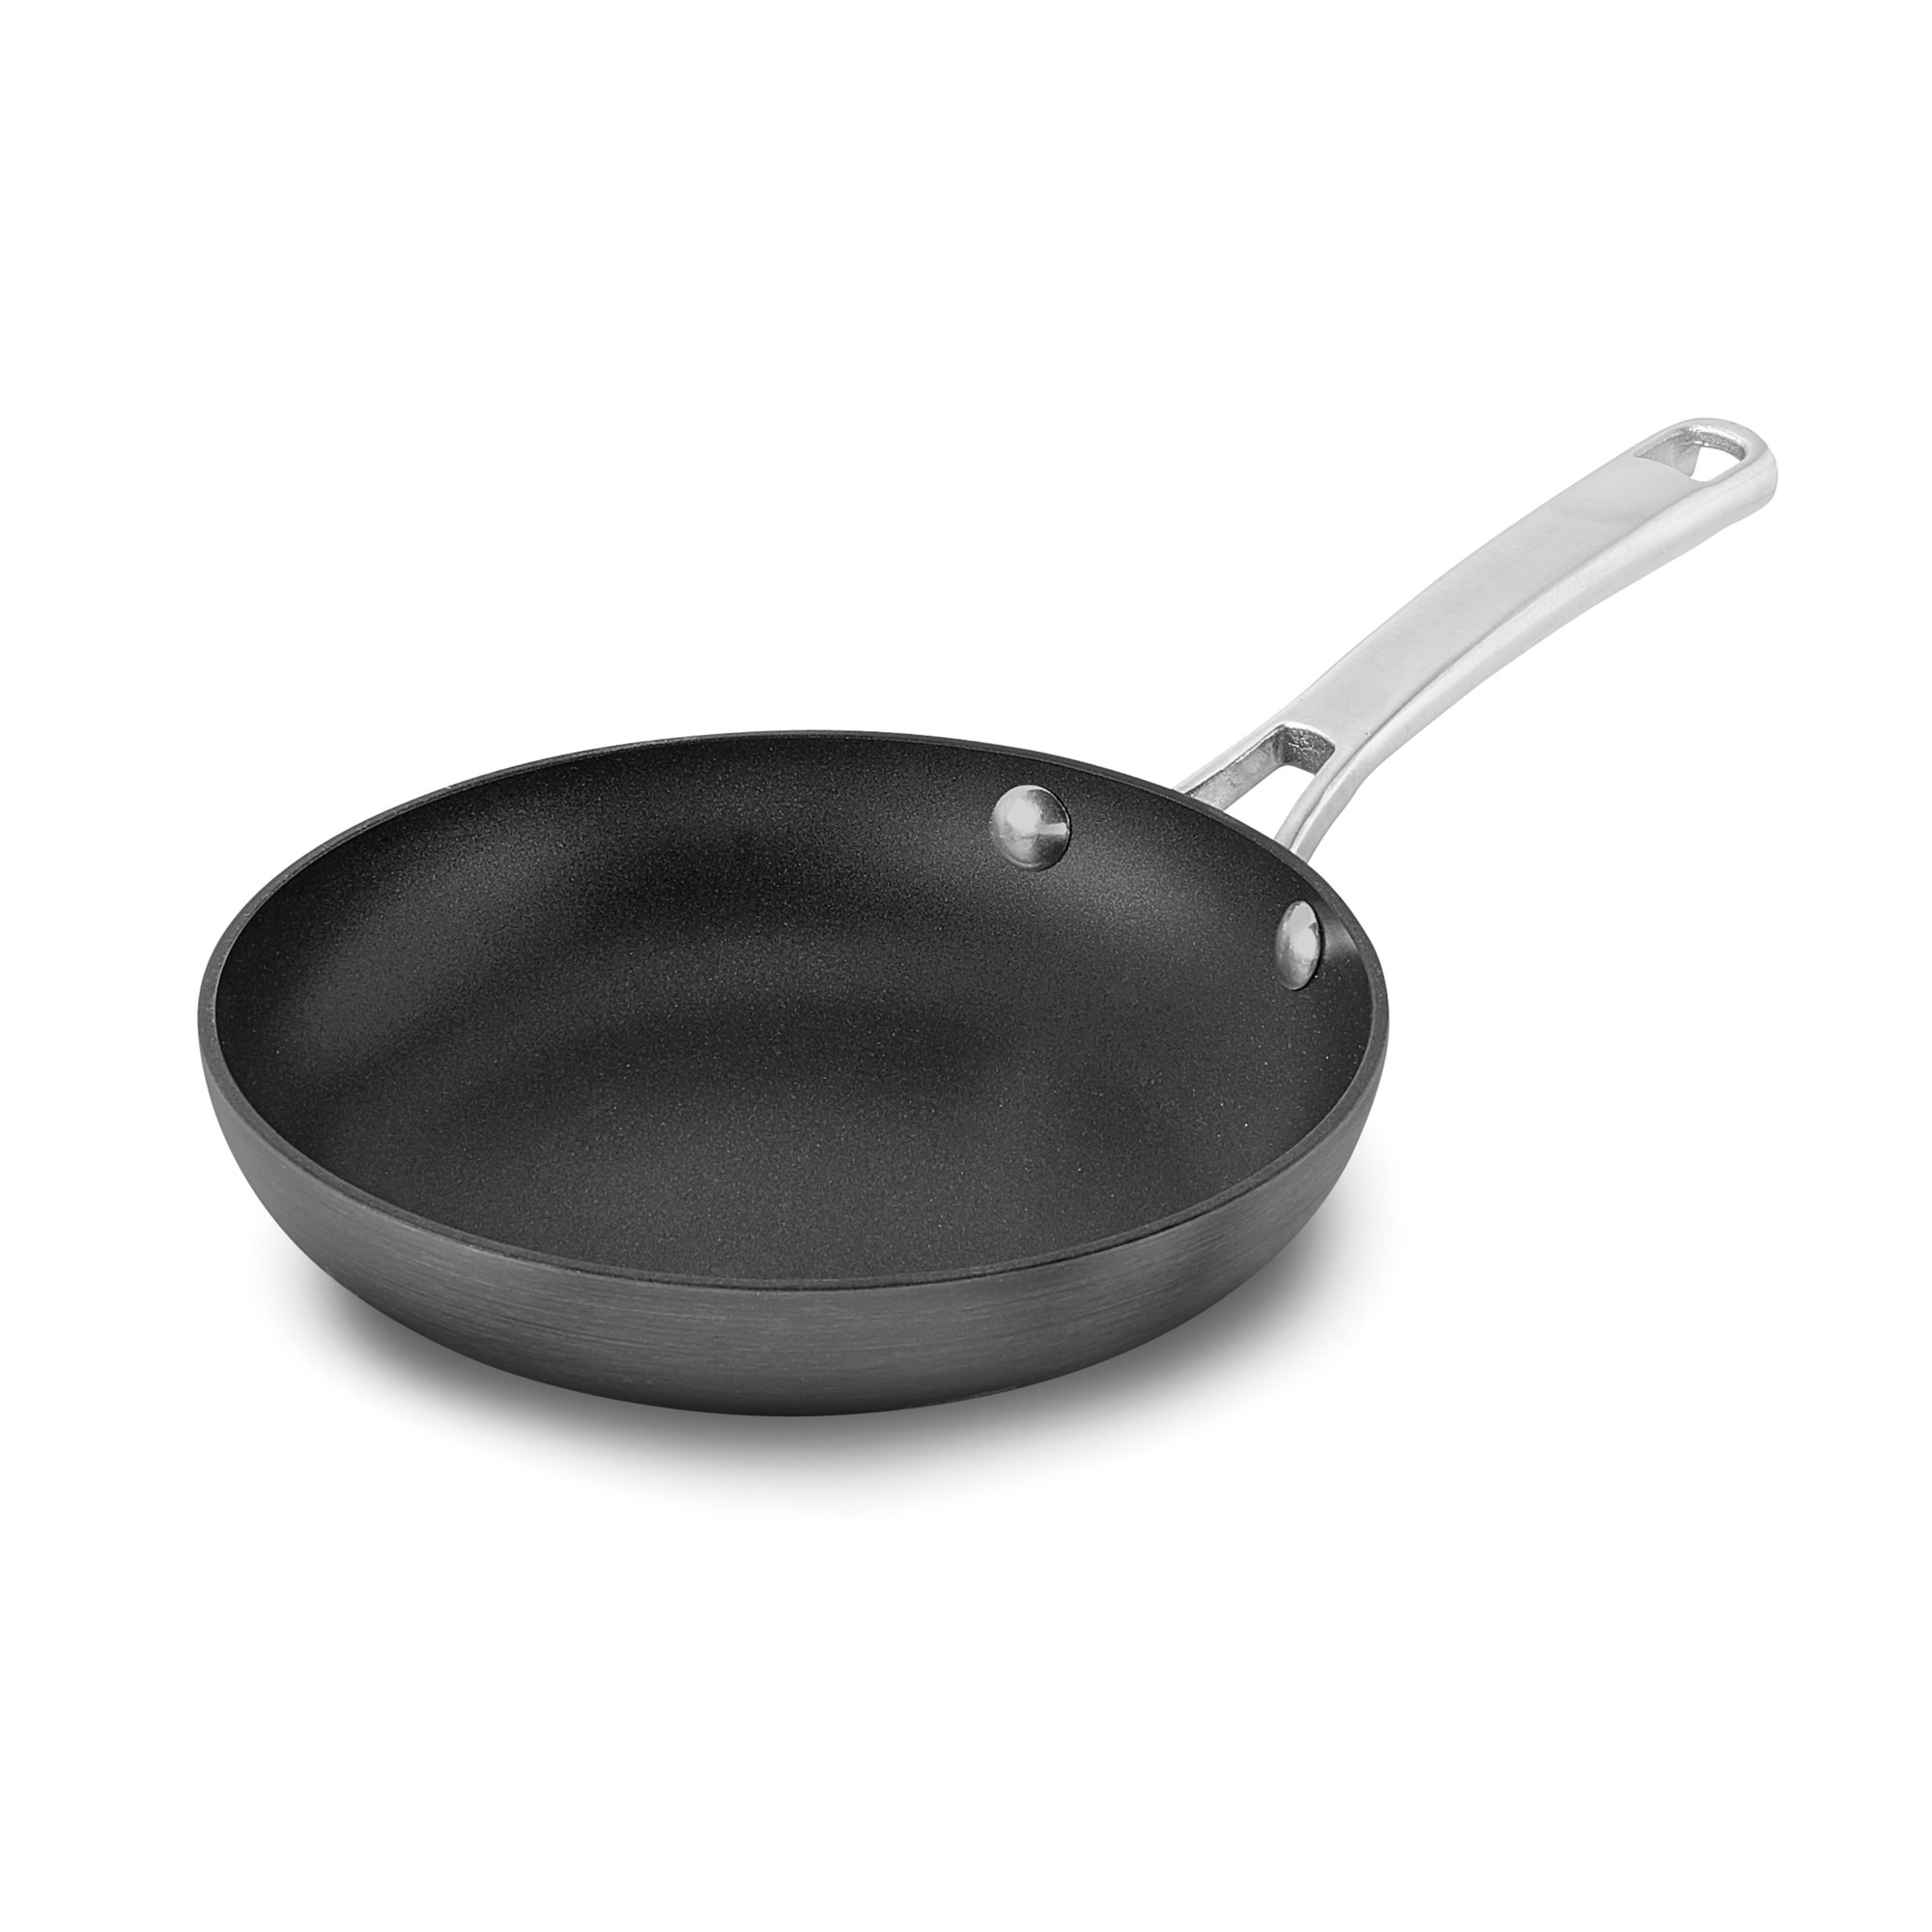 Calphalon Classic Nonstick 8 In Fry Pan Calphalonusastore